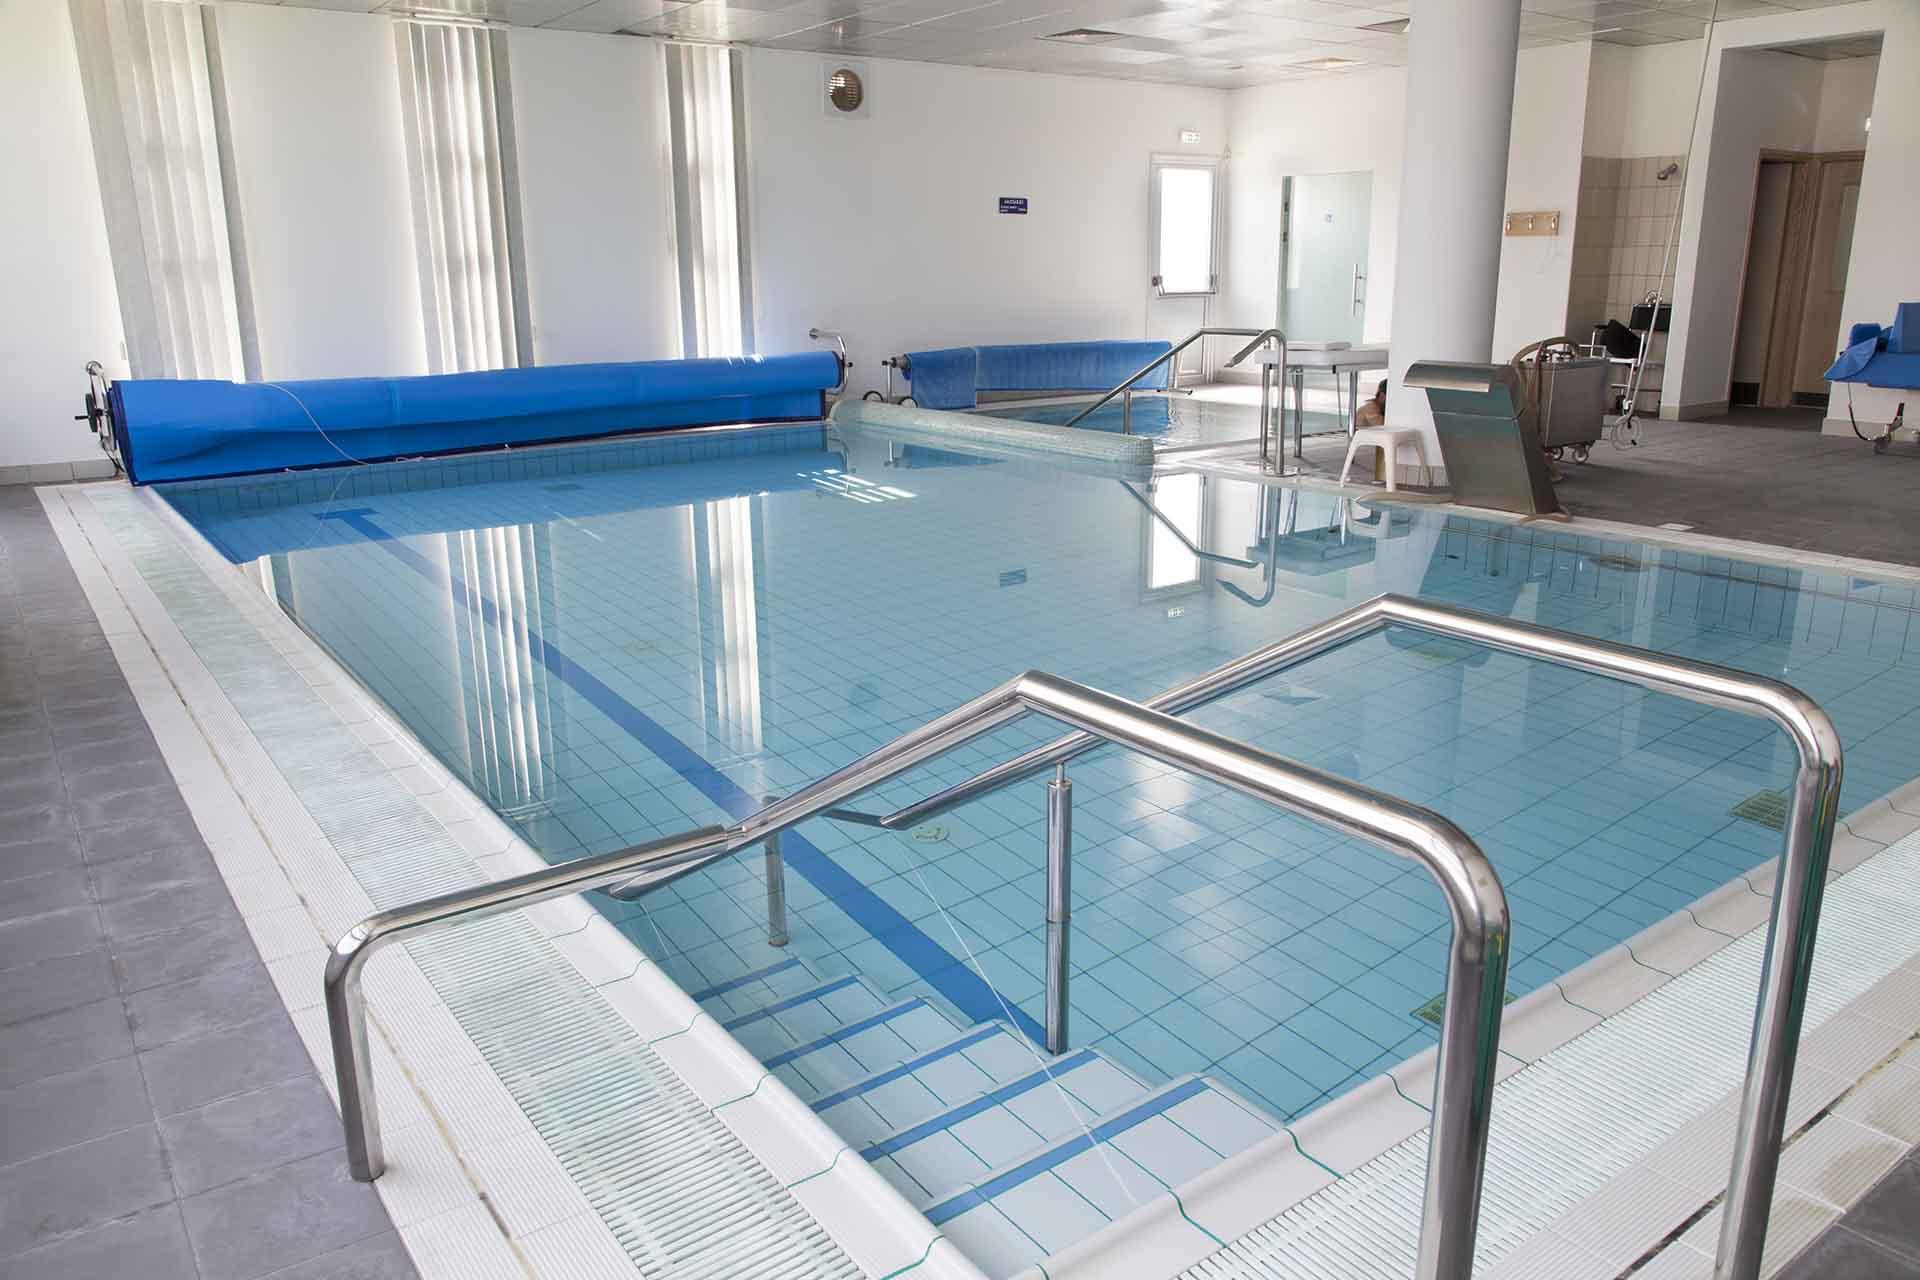 Toumazi Physio Gallery - Hydrotherapy pool